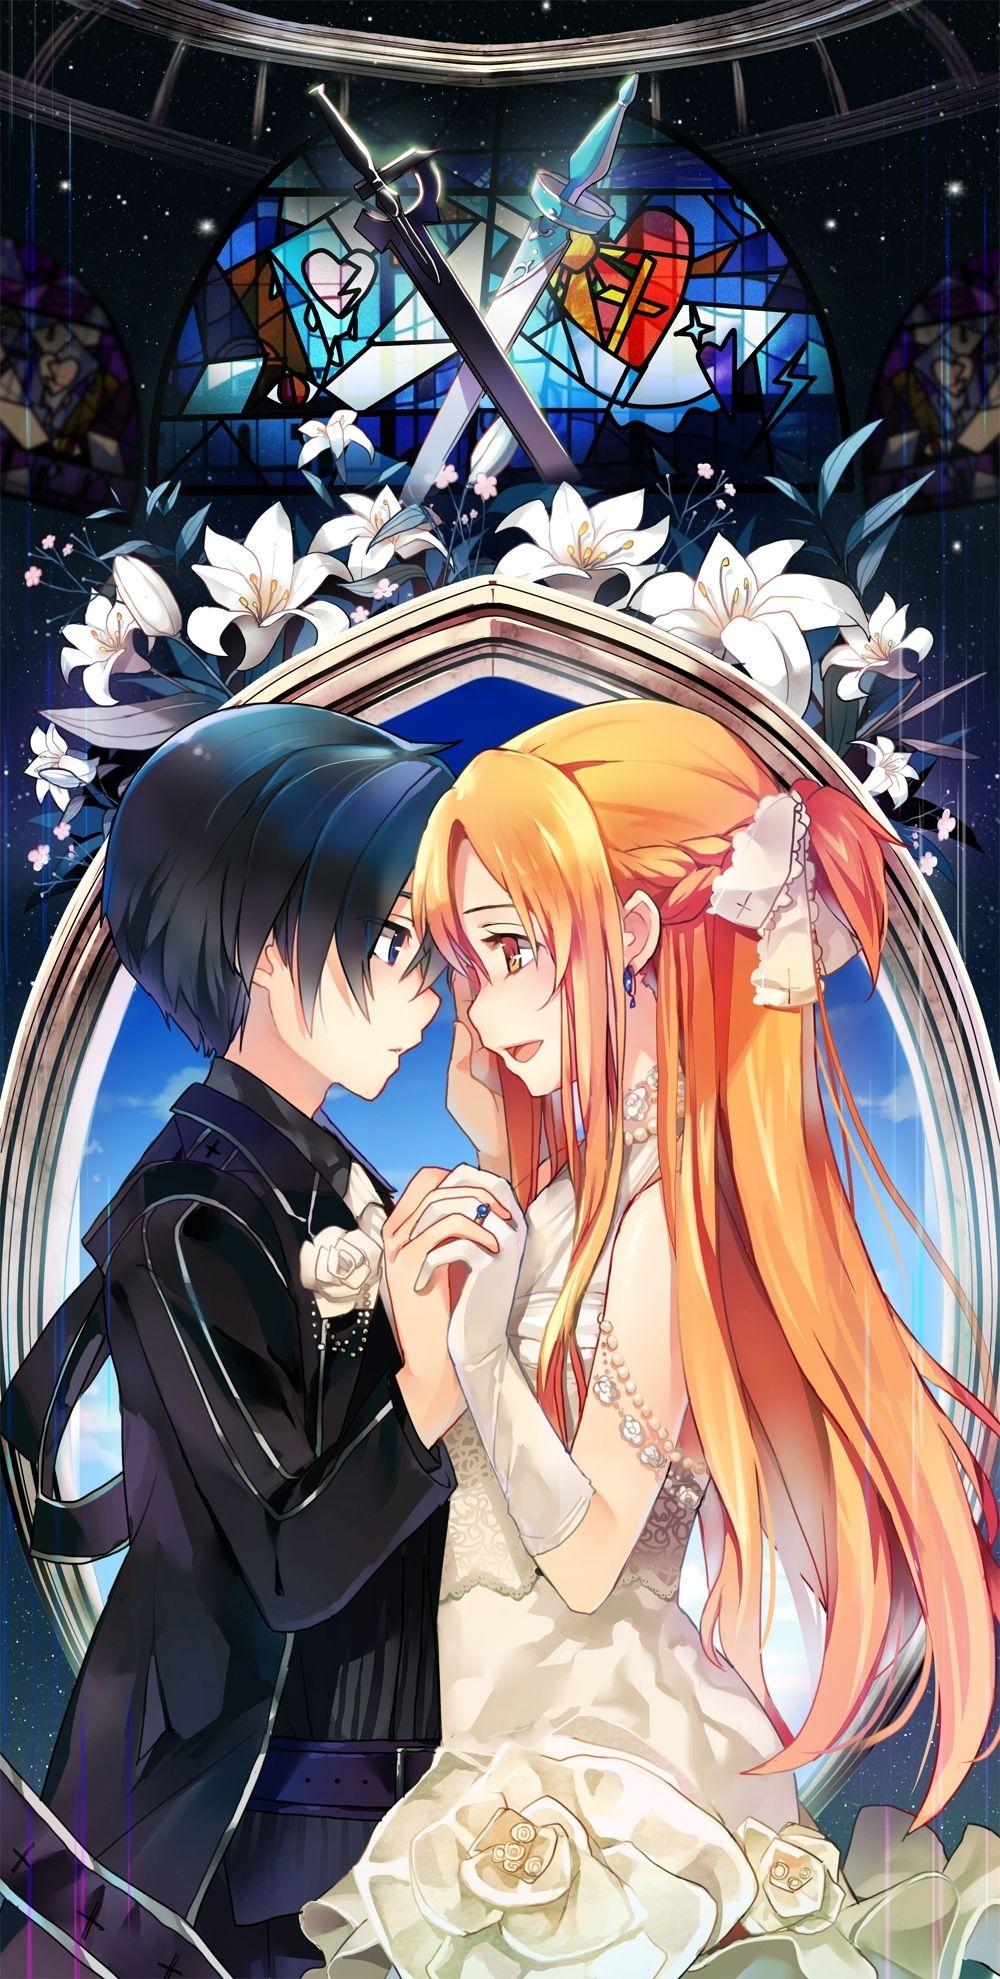 Sword Art Online Klein Loves Kirito Yoai Fanfiction